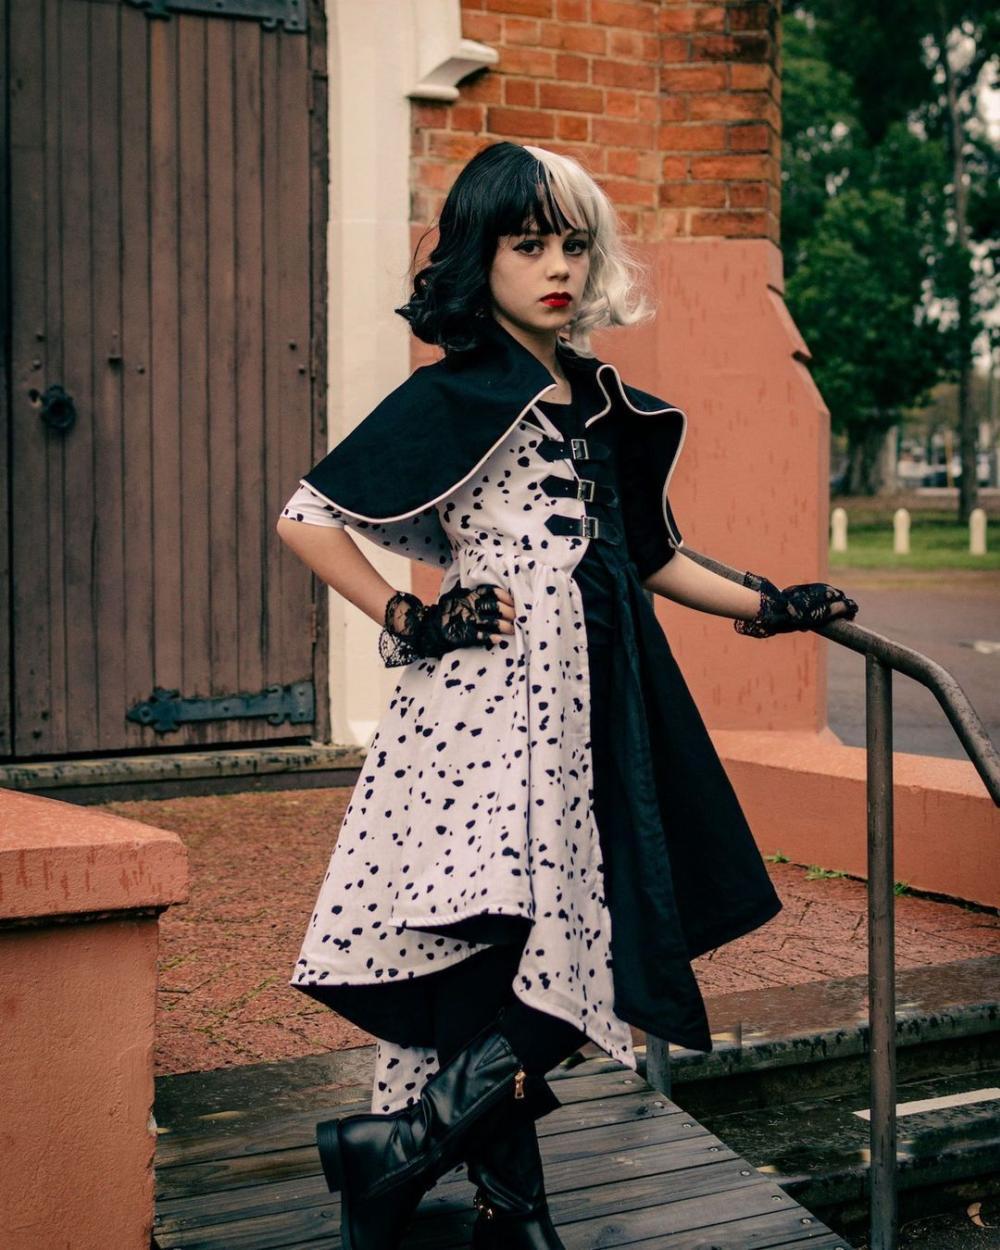 Cruella de vil easy halloween costumes for women